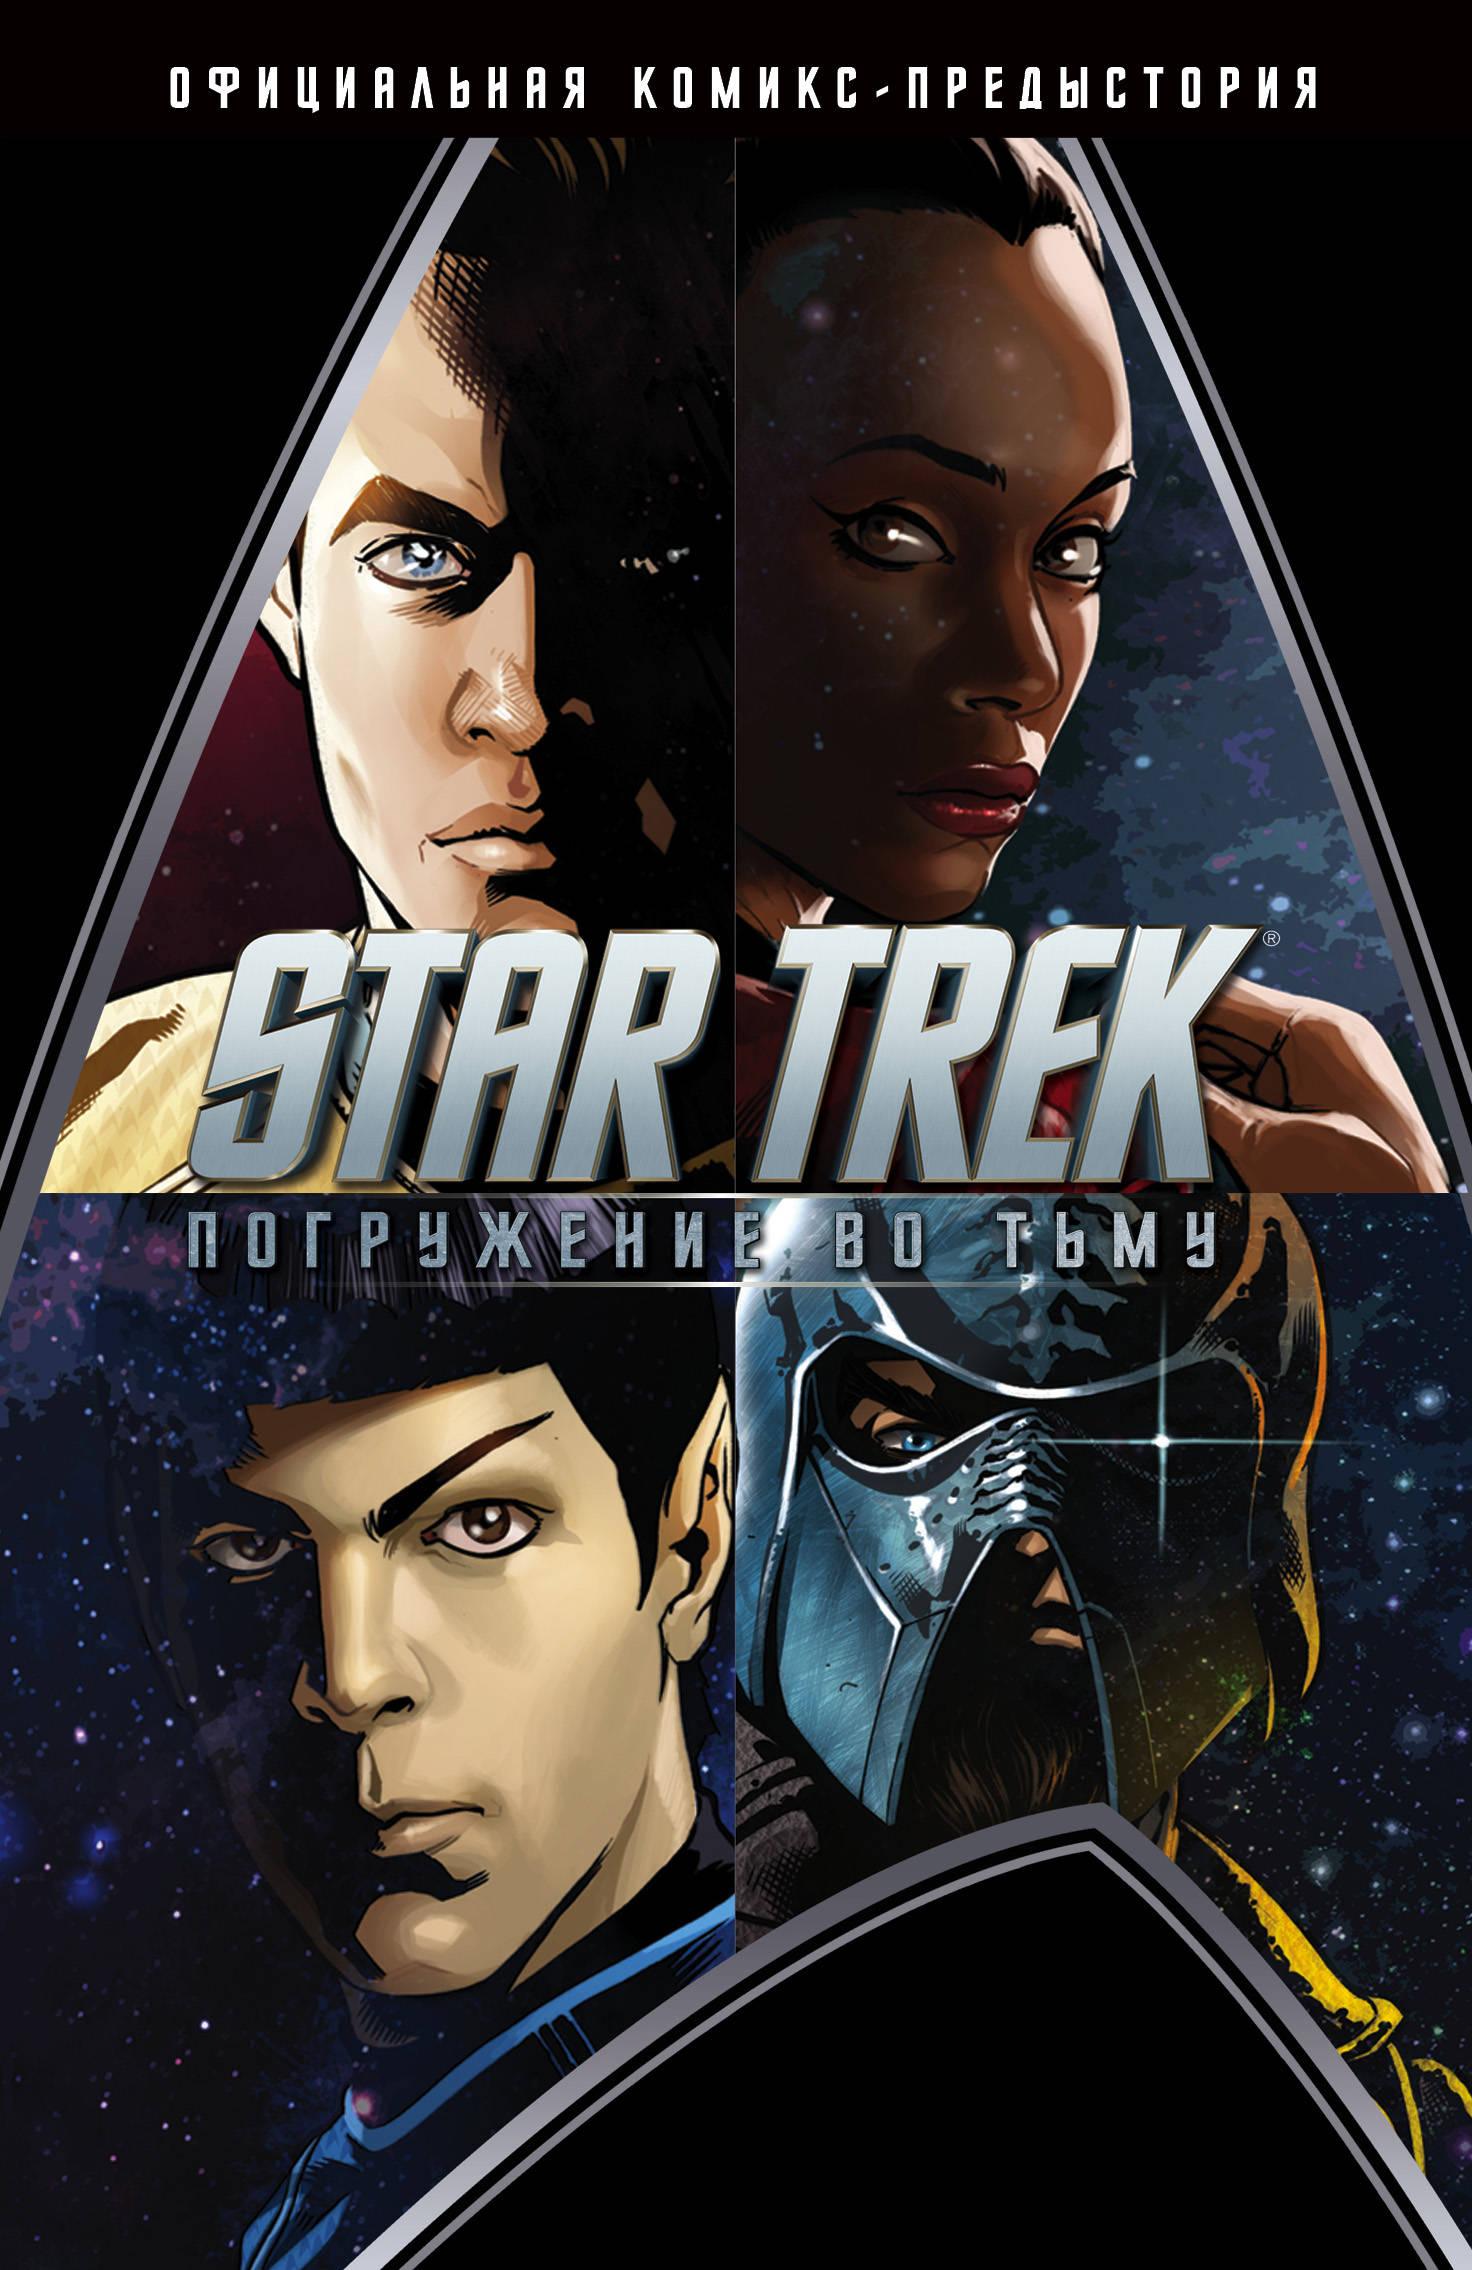 Роберто Орси, Майк Джонсон Star Trek. Погружение во тьму star trek том 7 столкновение у китомира